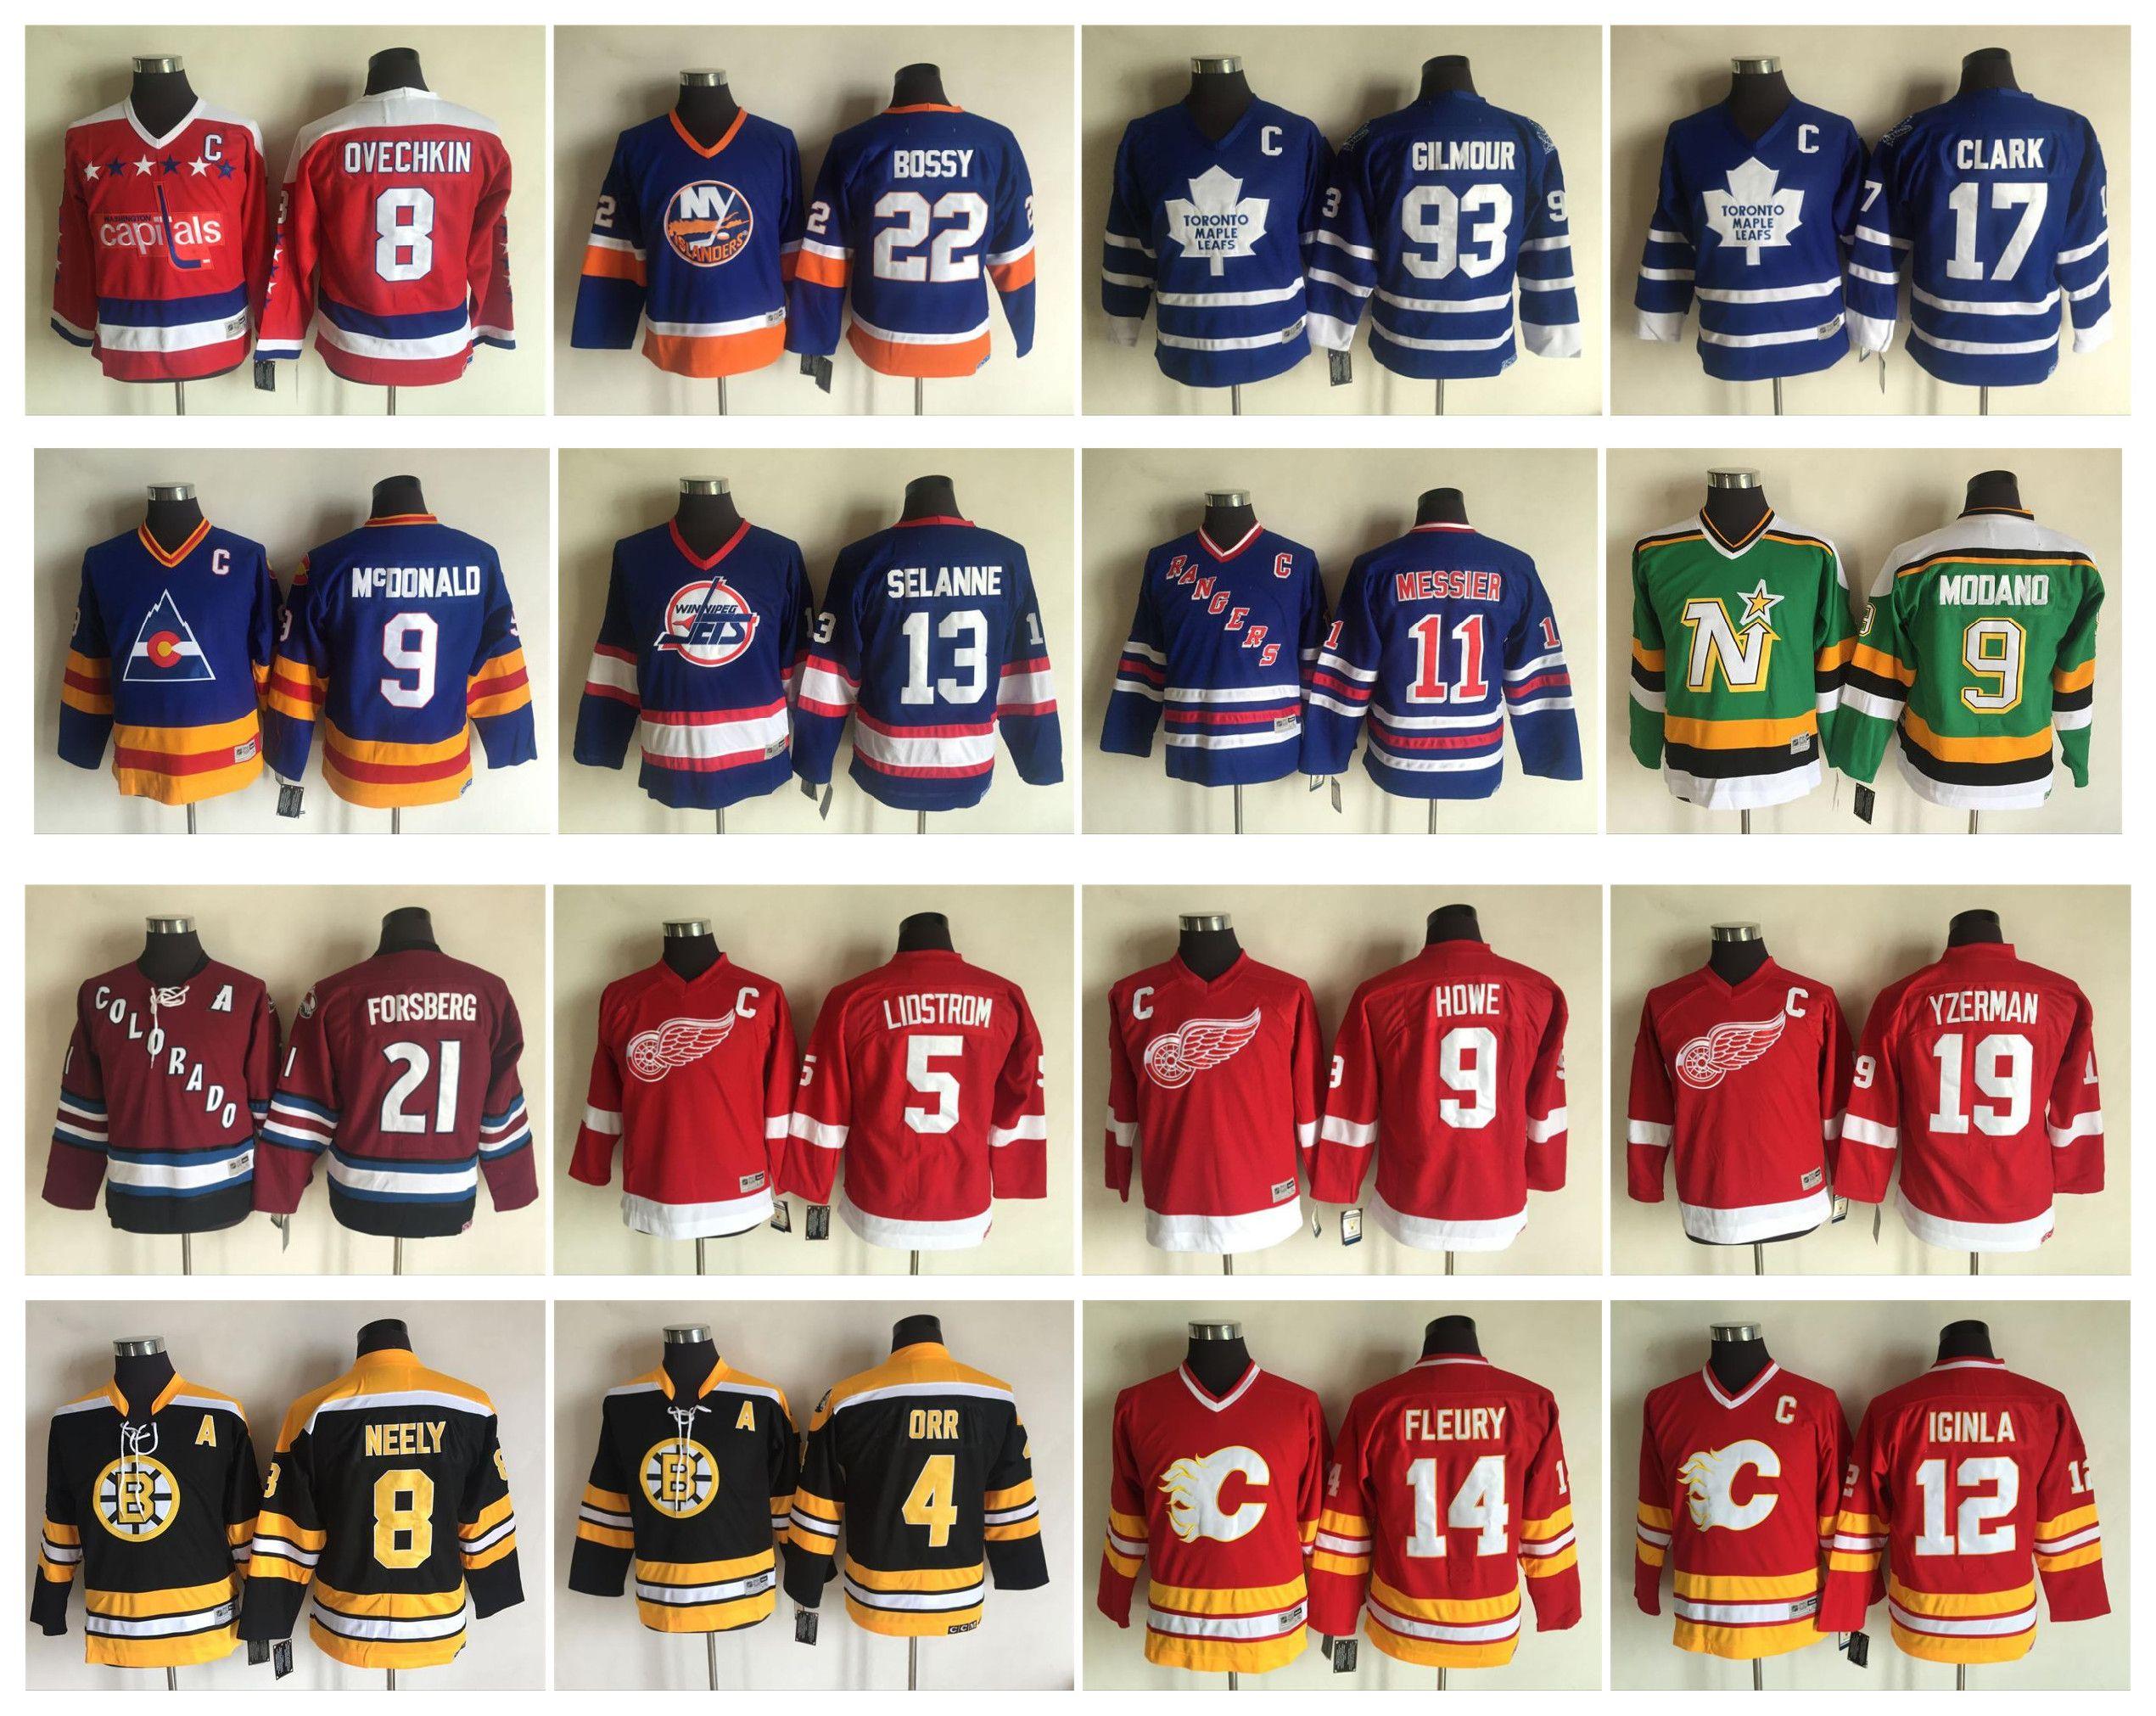 on sale 8002f 9952c Vintage Kids Hockey Jersey 8 Alexander Ovechkin 93 Doug Gilmour 17 Wendel  Clark 21 Peter Forsberg 9 Mike Modano 9 Gordie Howe Yzerman Youth